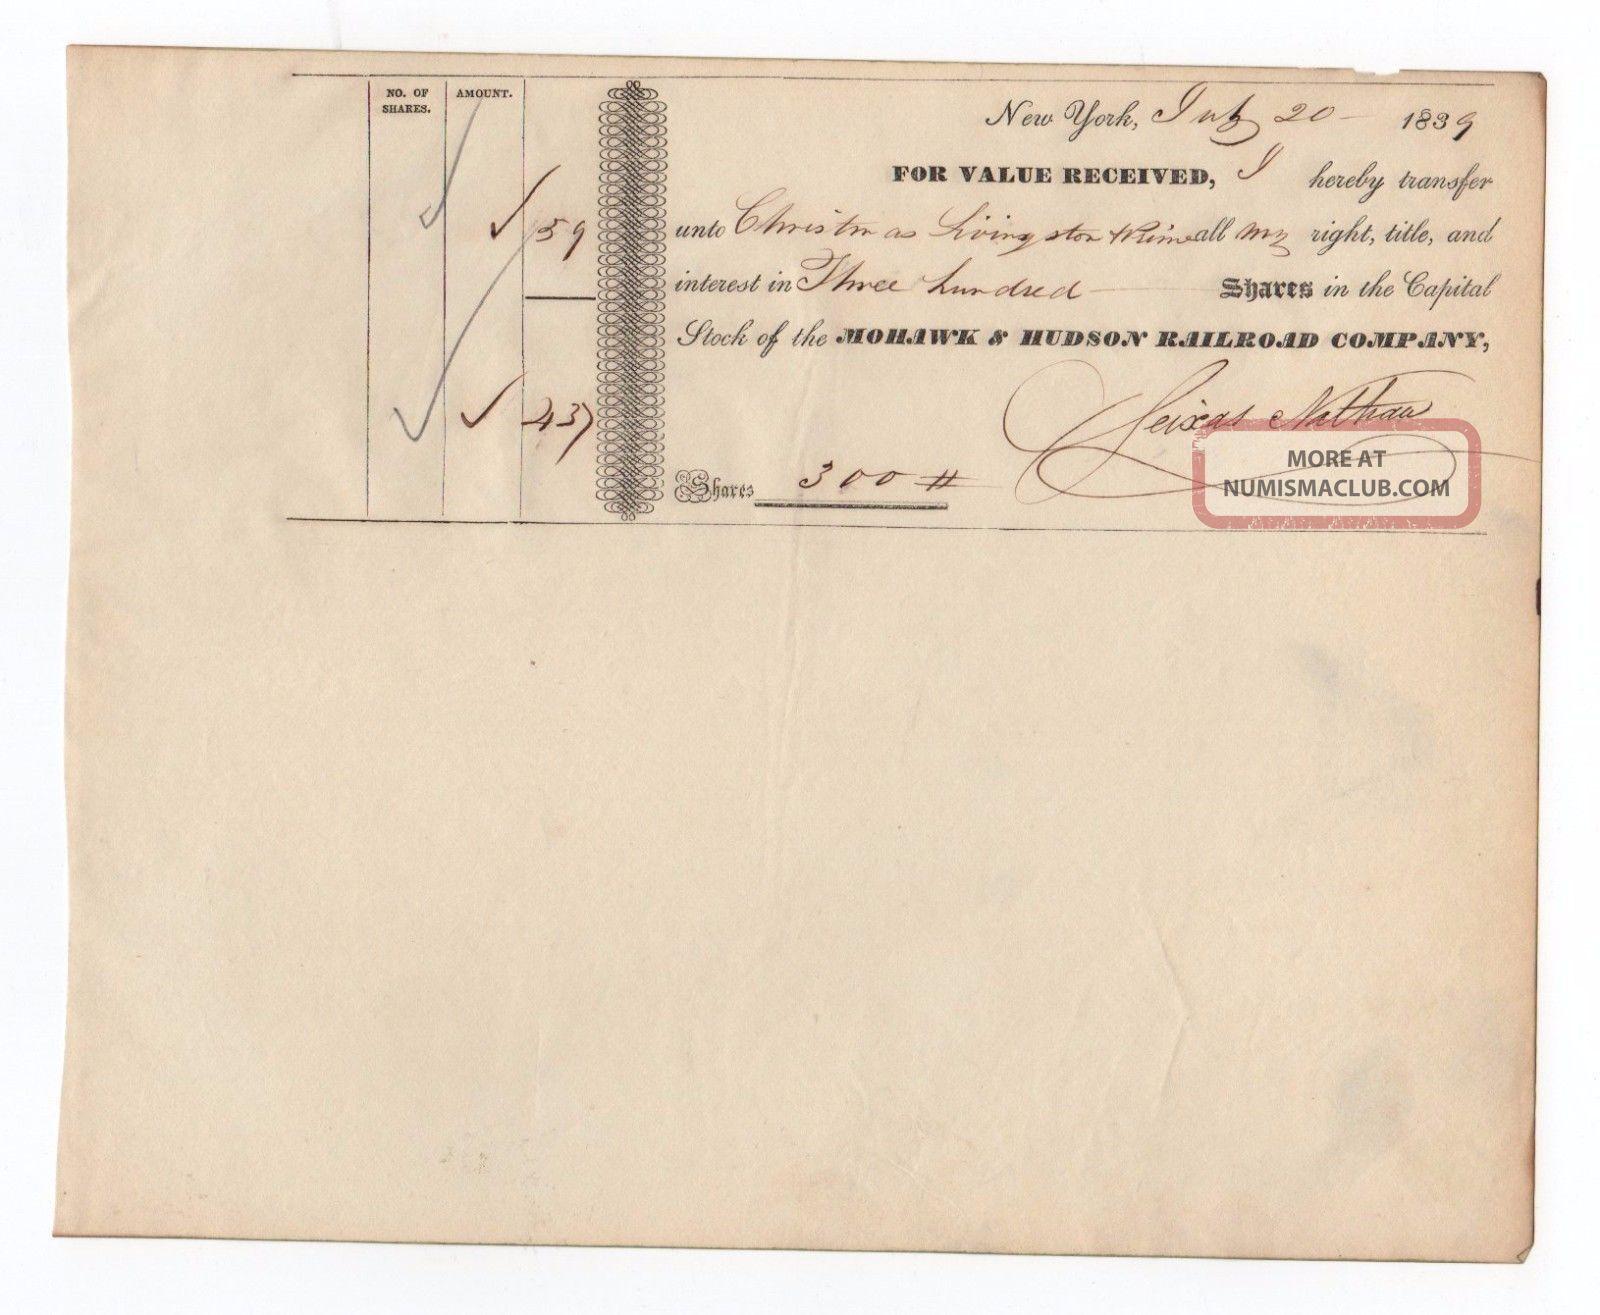 1839 Mohawk And Hudson Railroad Company Stock Transfer Transportation photo